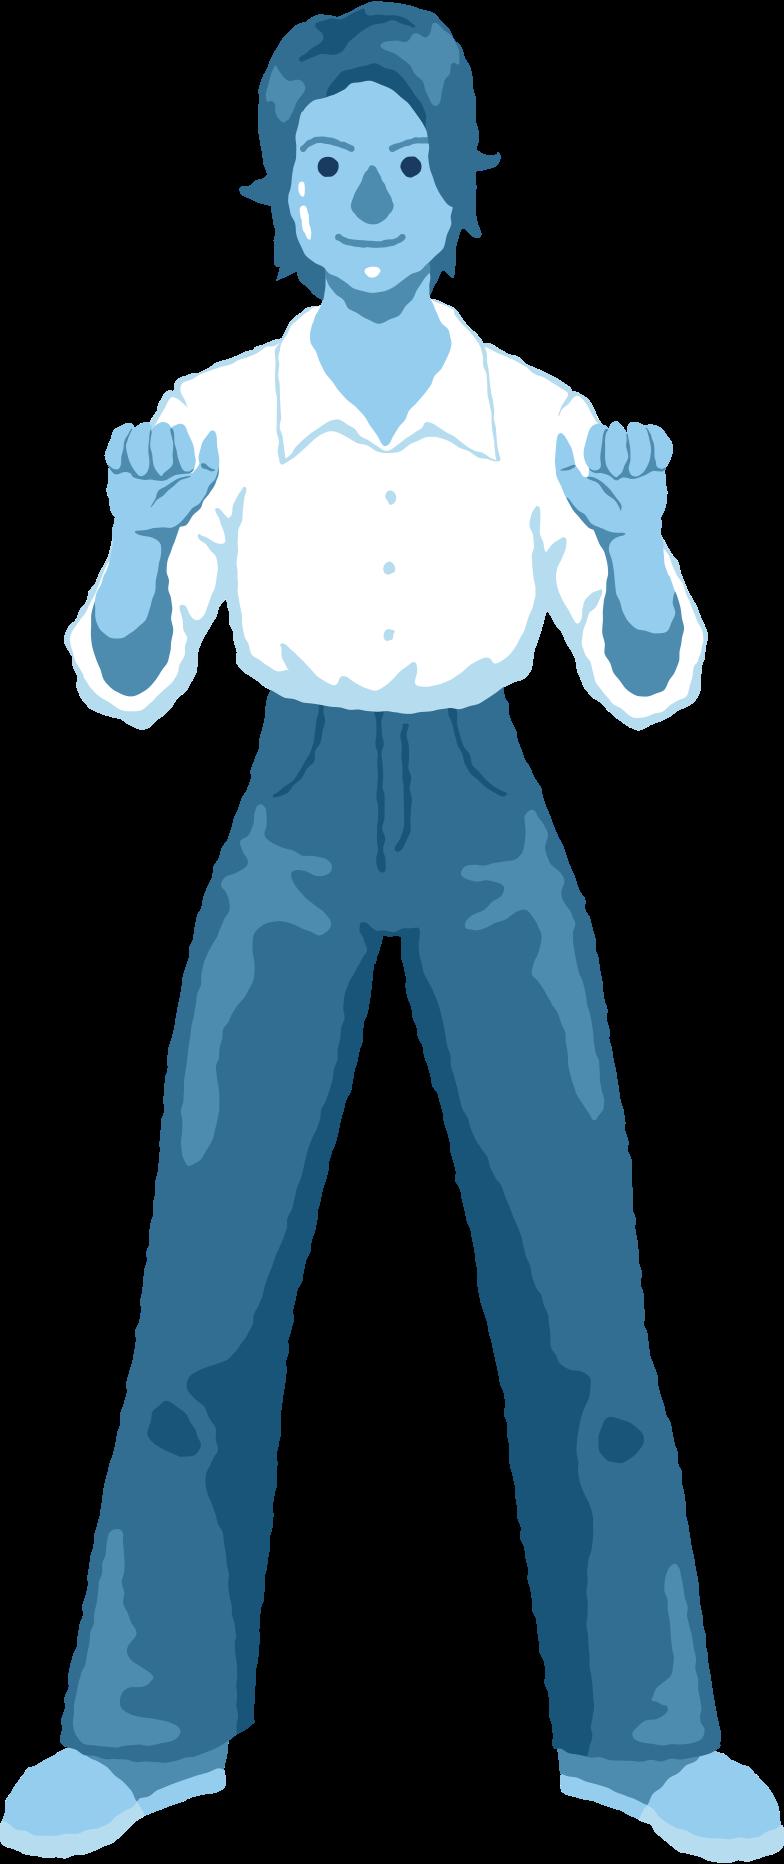 white girl Clipart illustration in PNG, SVG